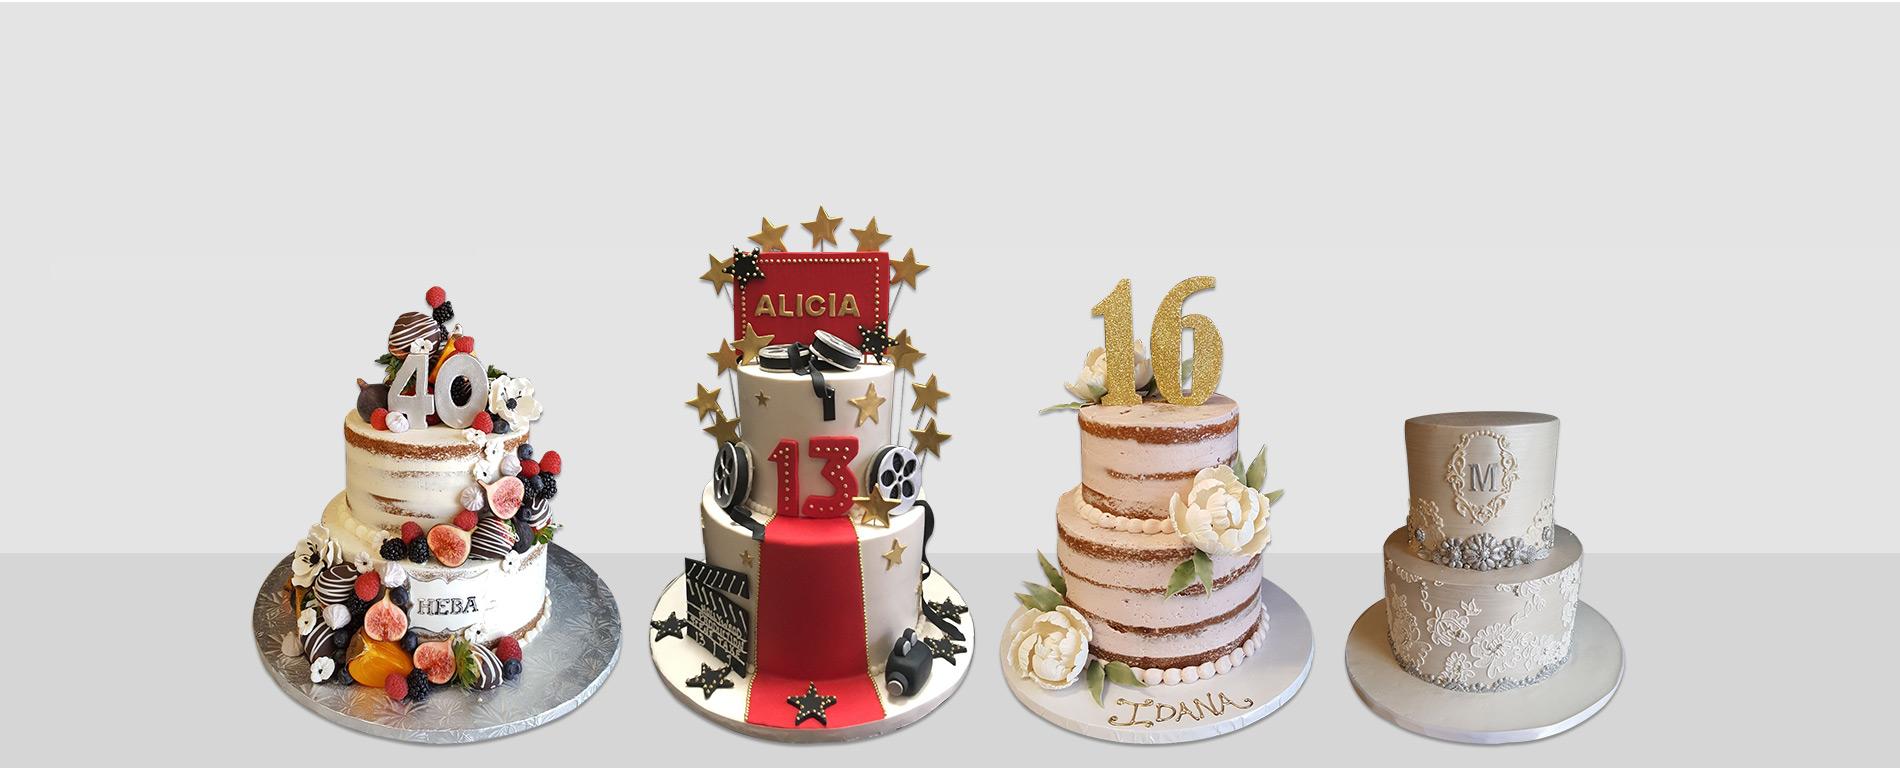 Custom Cakes by La Rose in Milton, ON